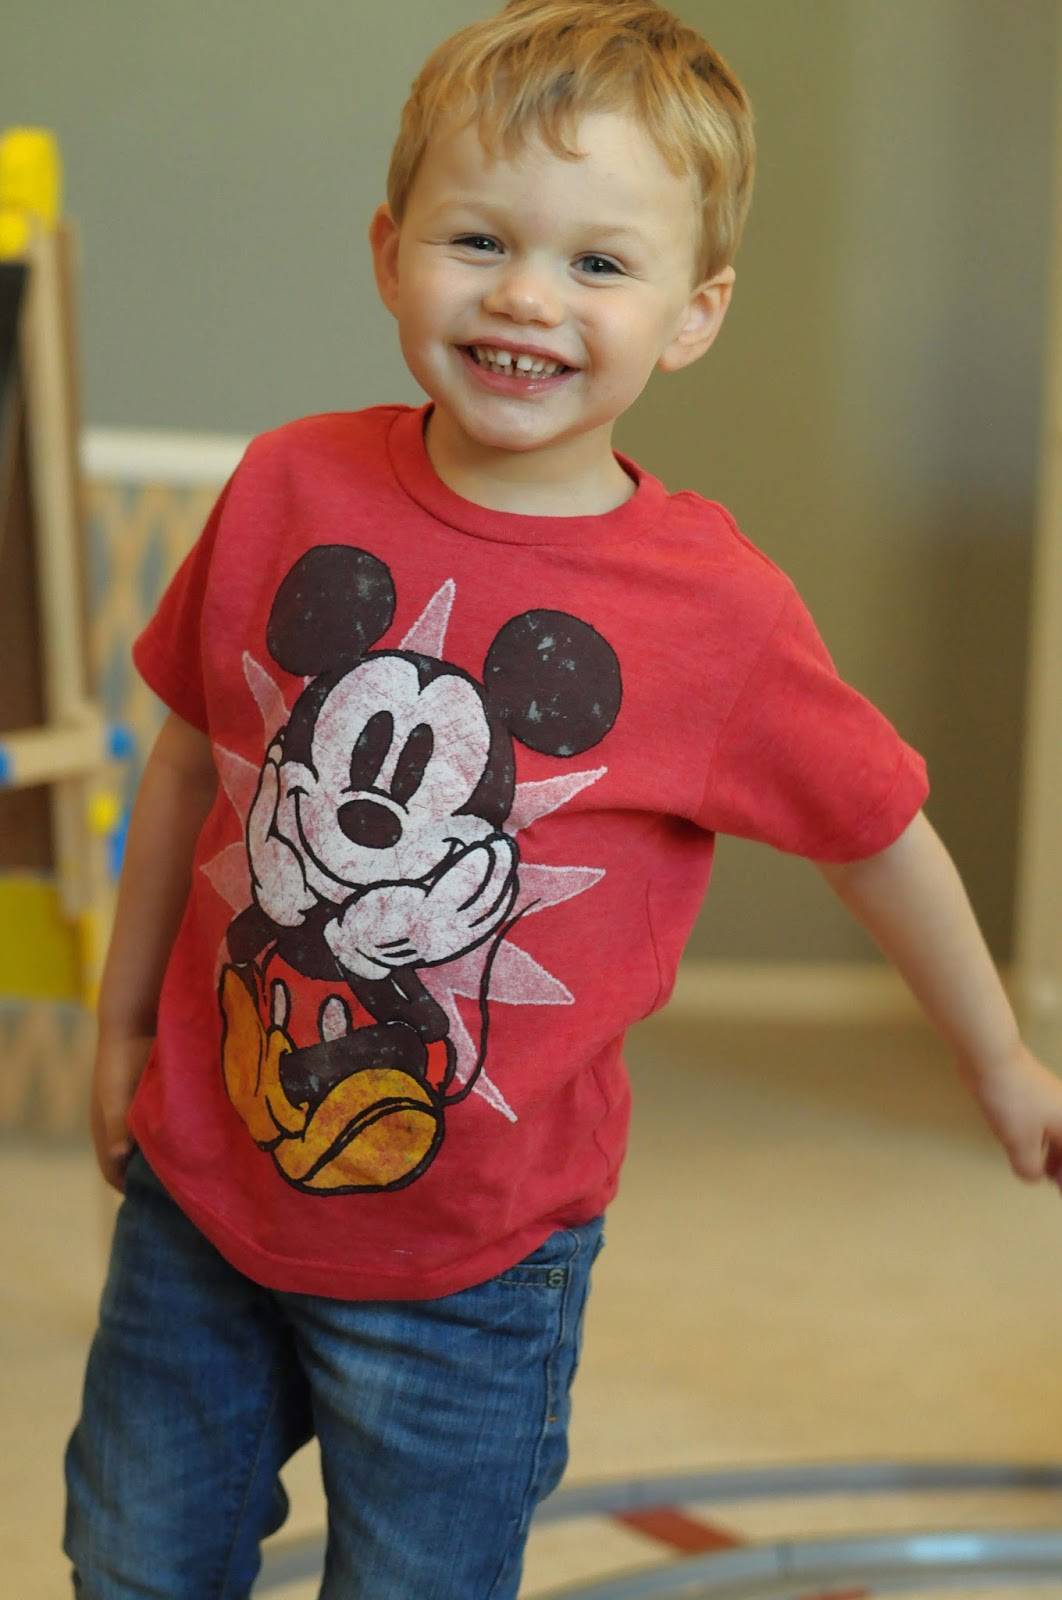 Birthday Boy Shirt For 2 Year Old